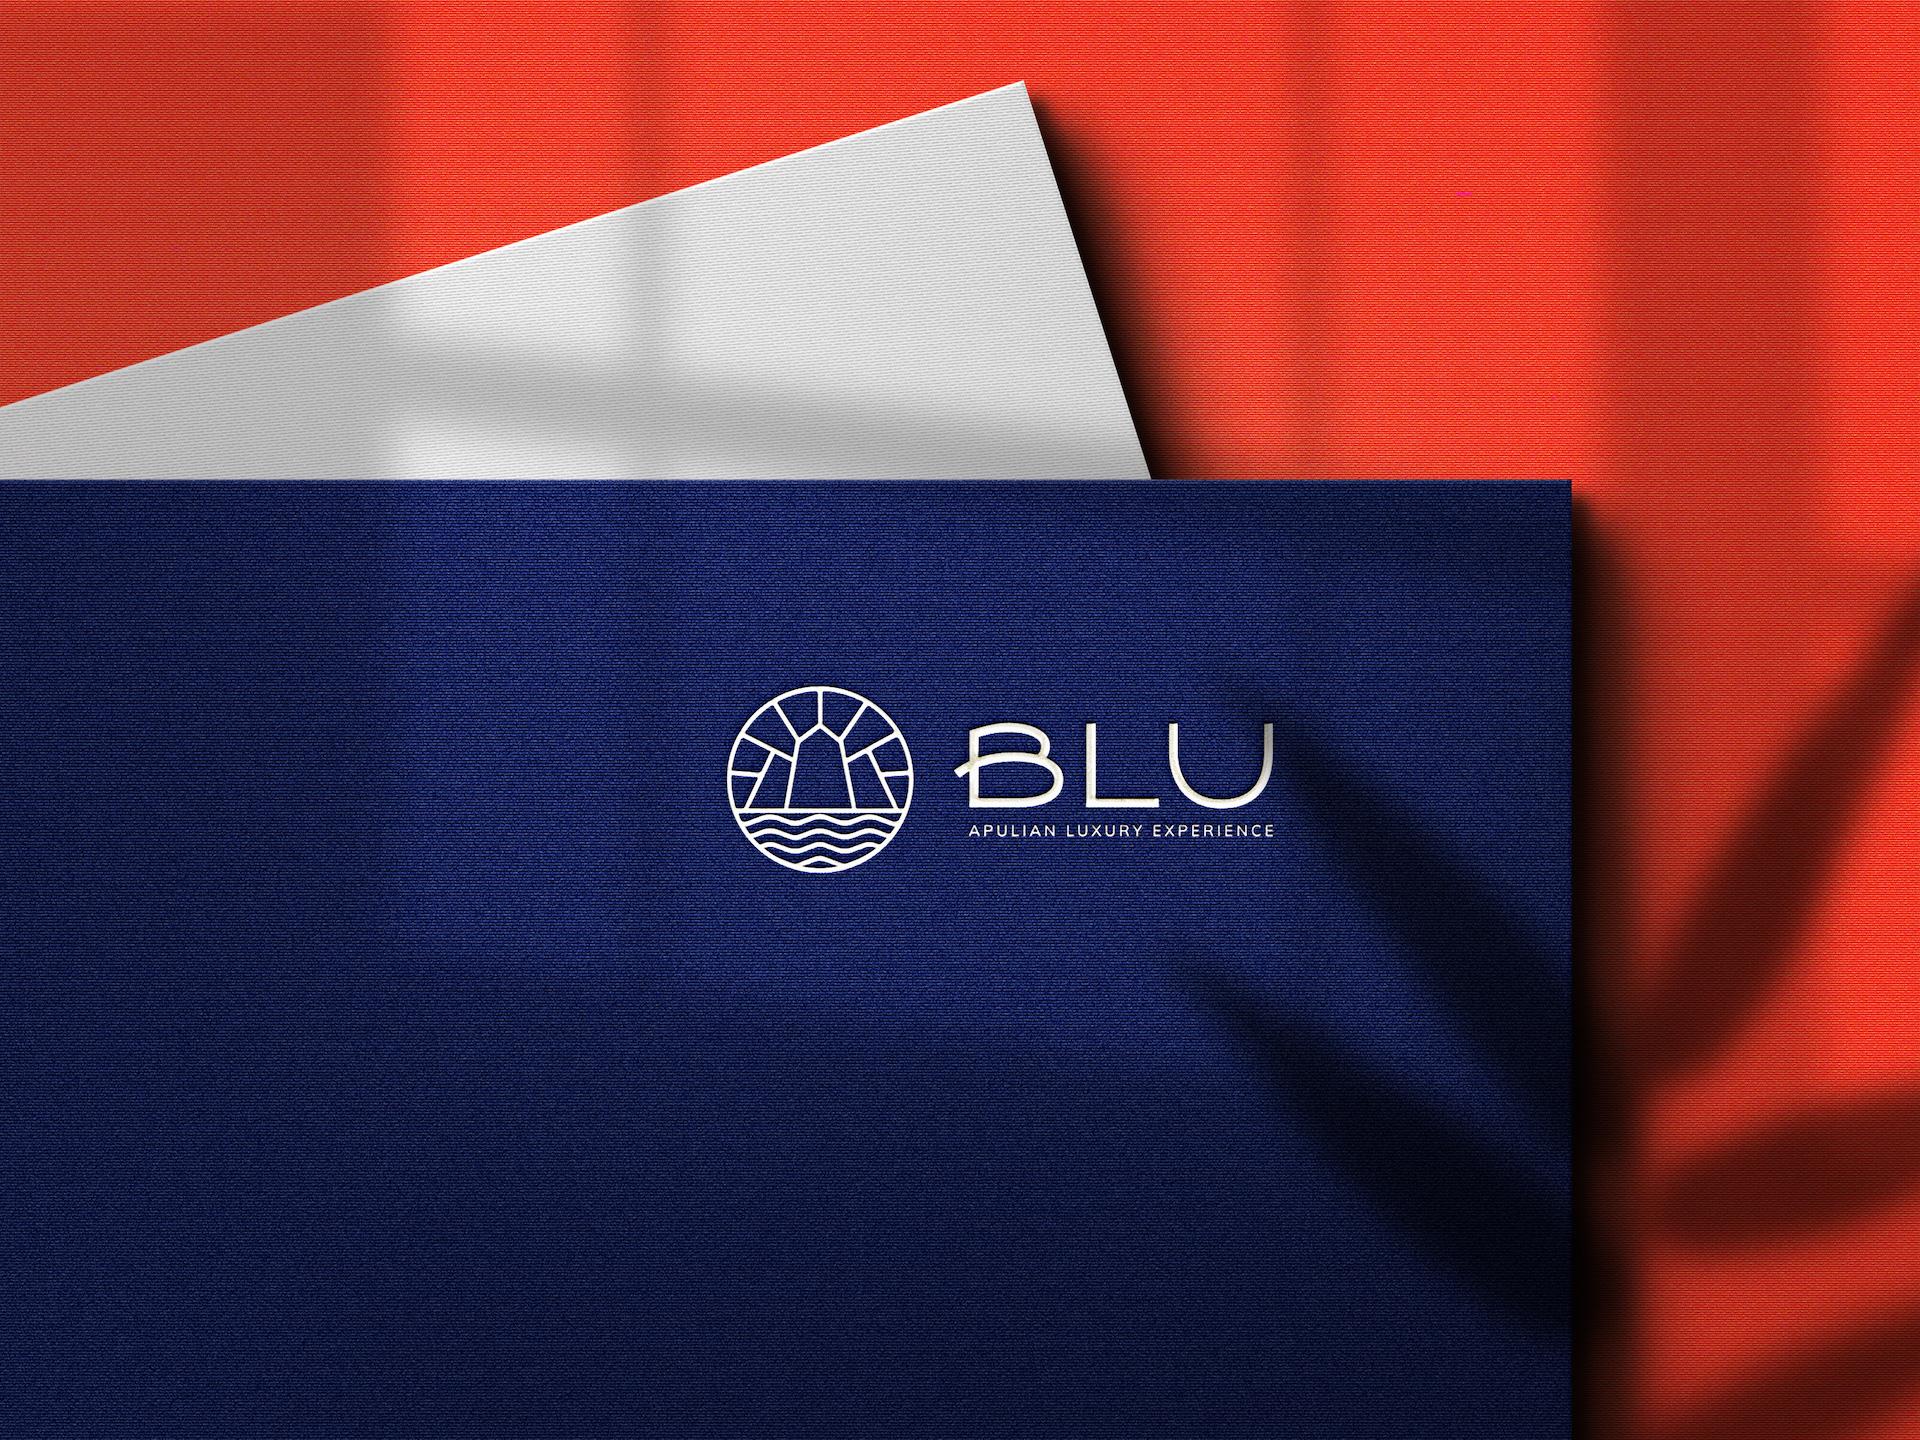 BLU – Apulian luxury Experience